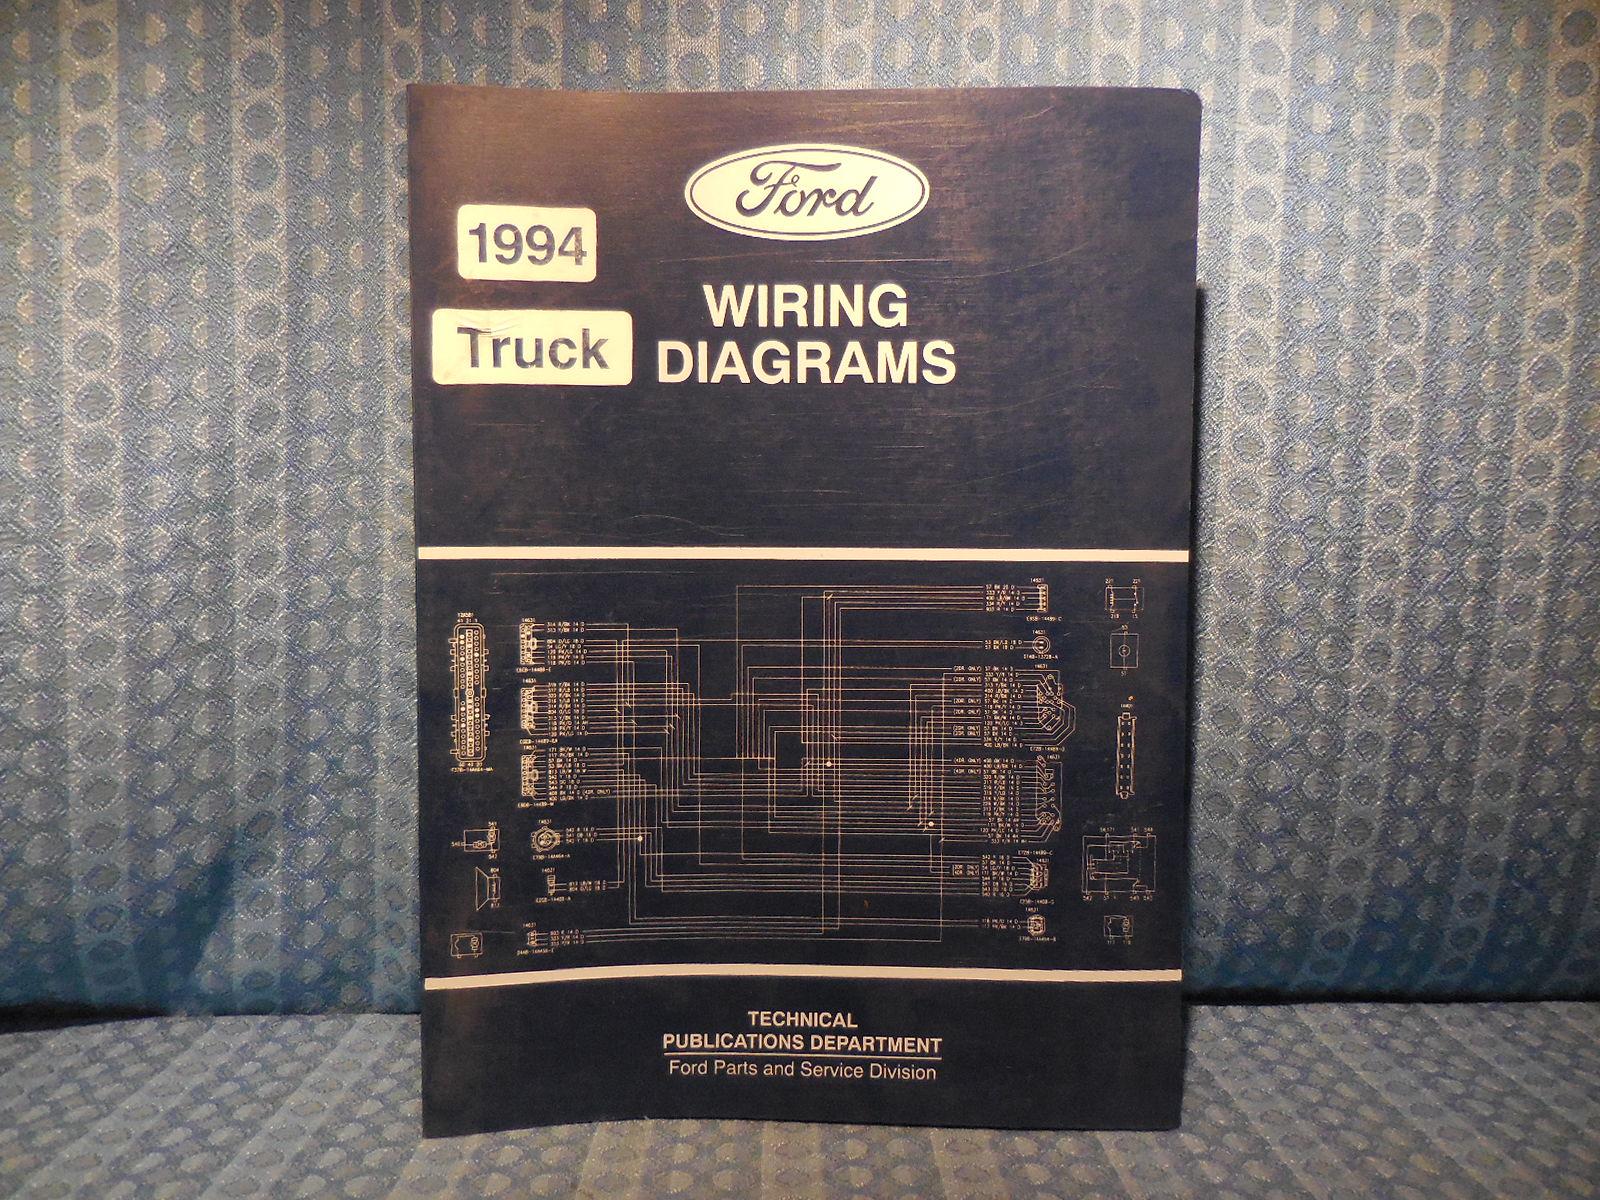 1990 F600 Wiring Diagram Library For 1966 Ford Truck Starter Detailed Schematics Fiesta